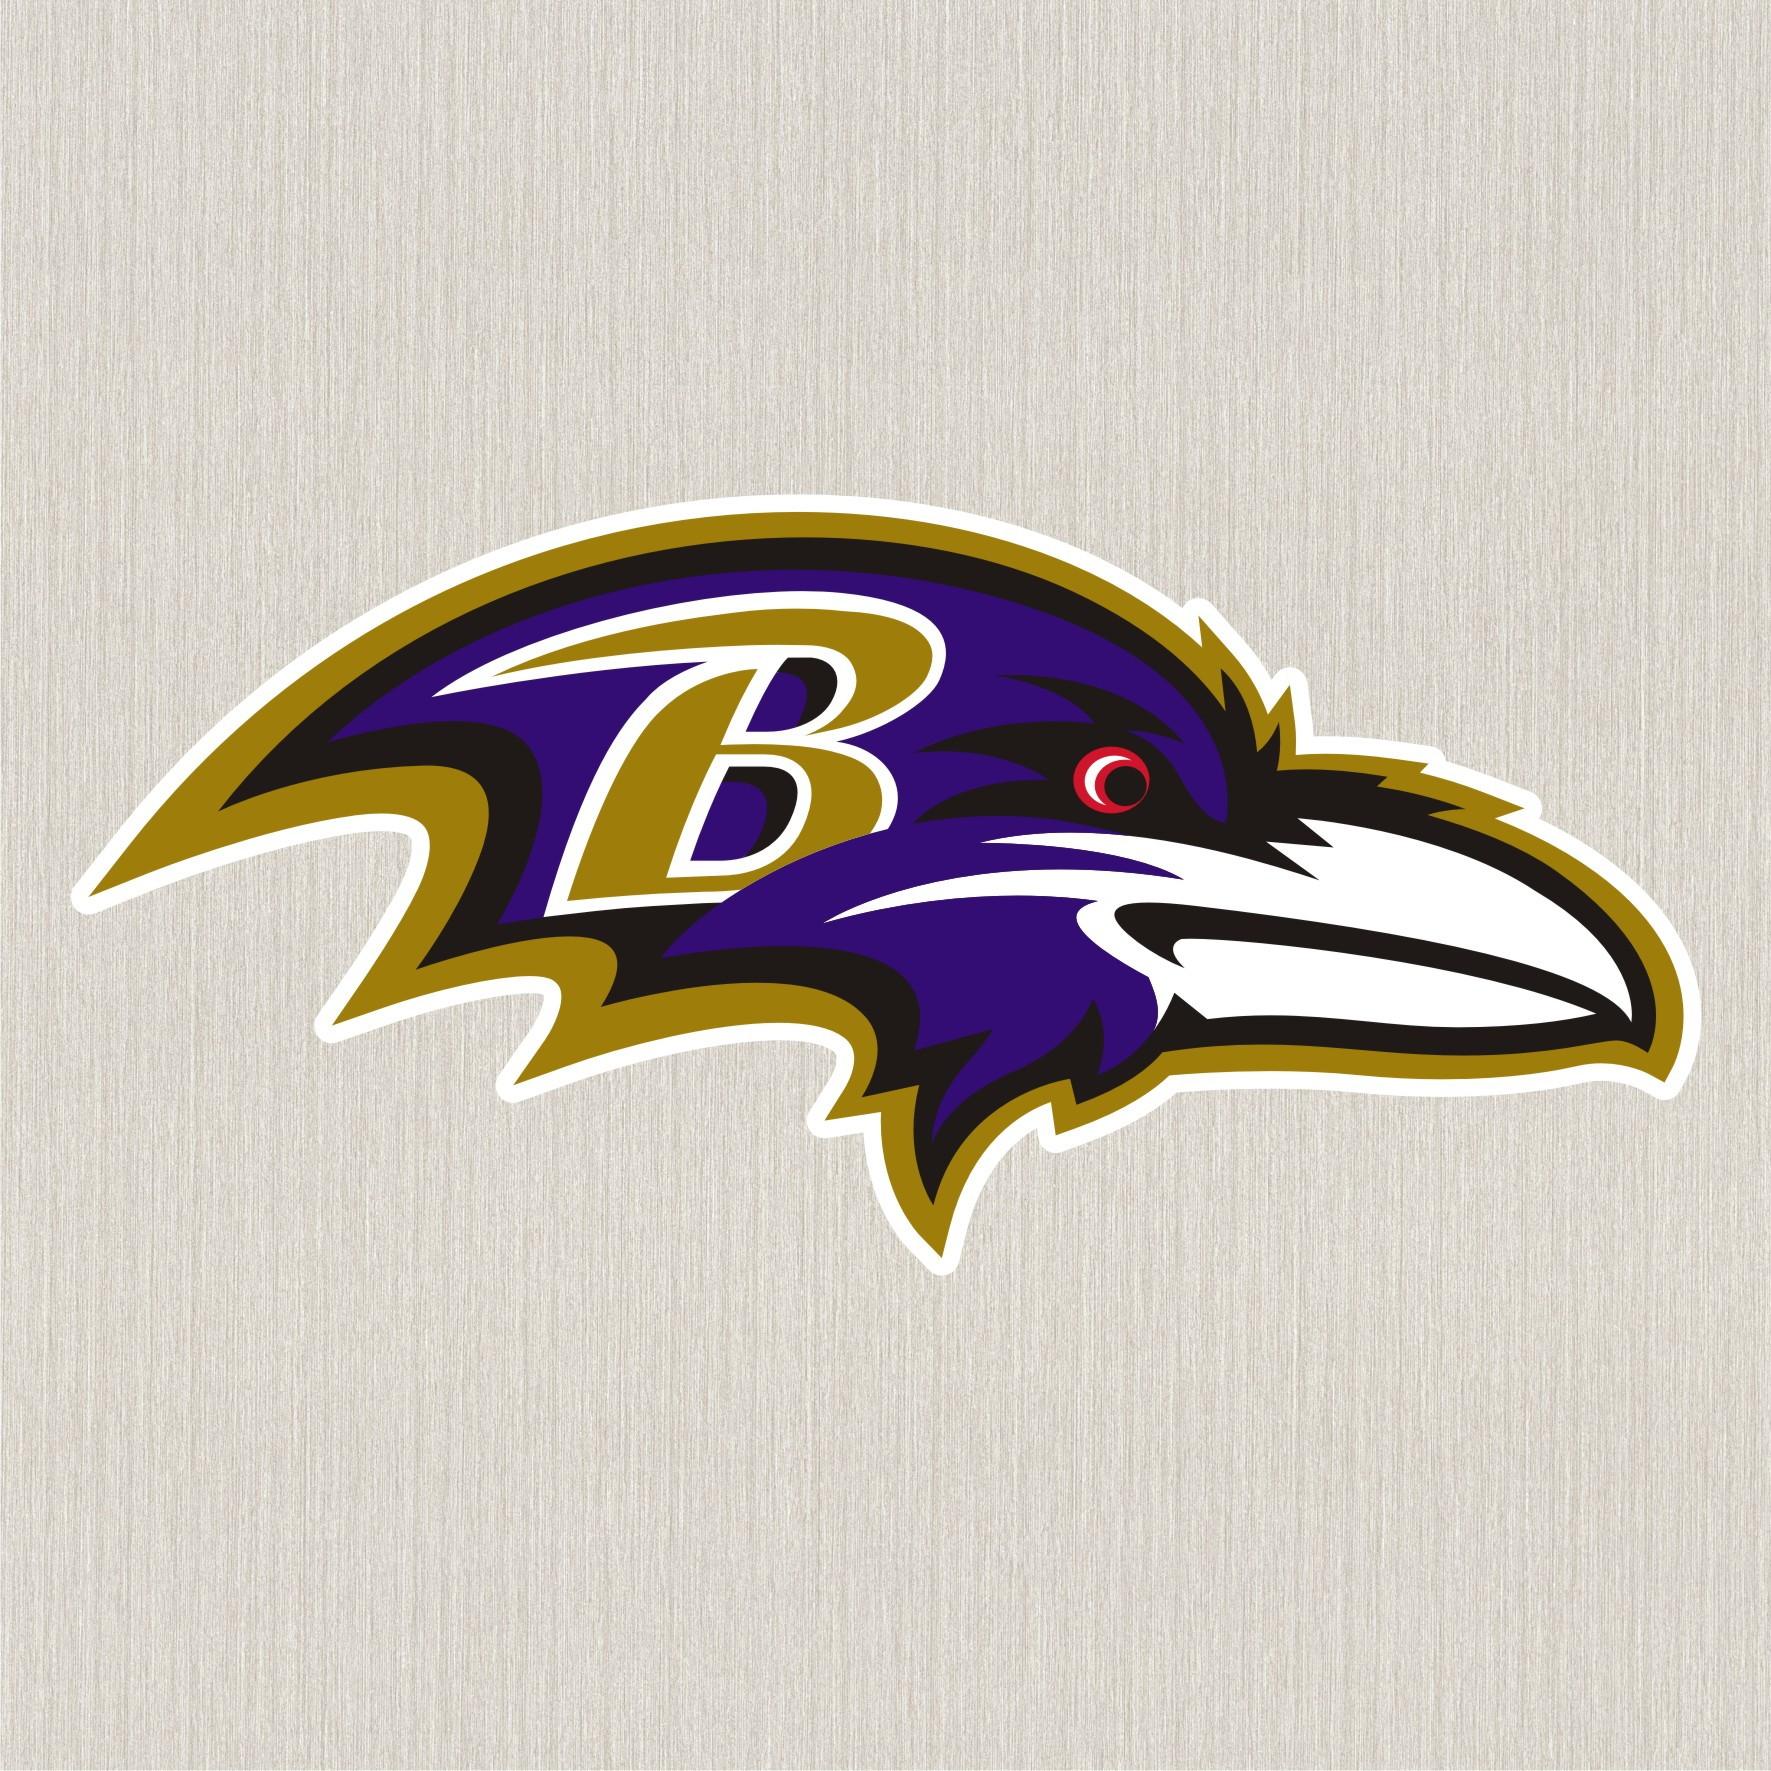 bdceec846 Camiseta Baltimore Ravens Nfl Futebol